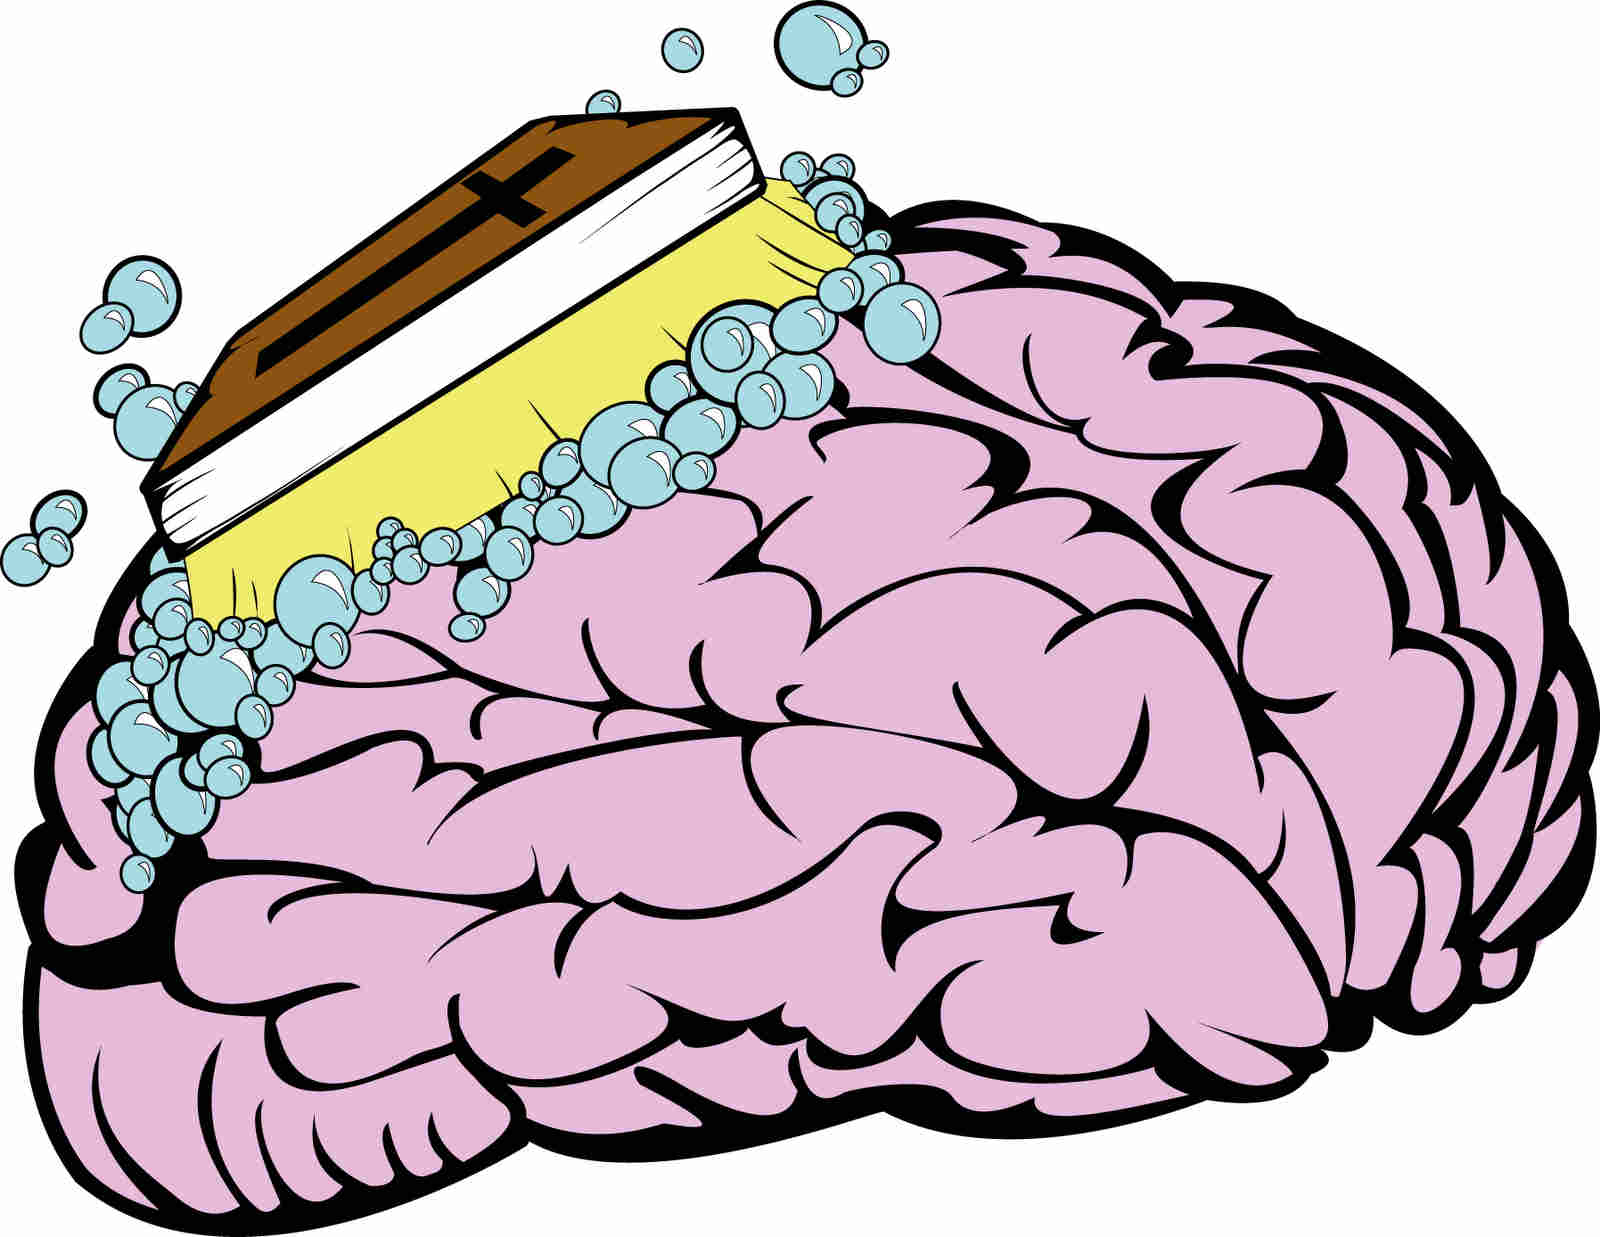 signos de enfermedad de Alzheimer